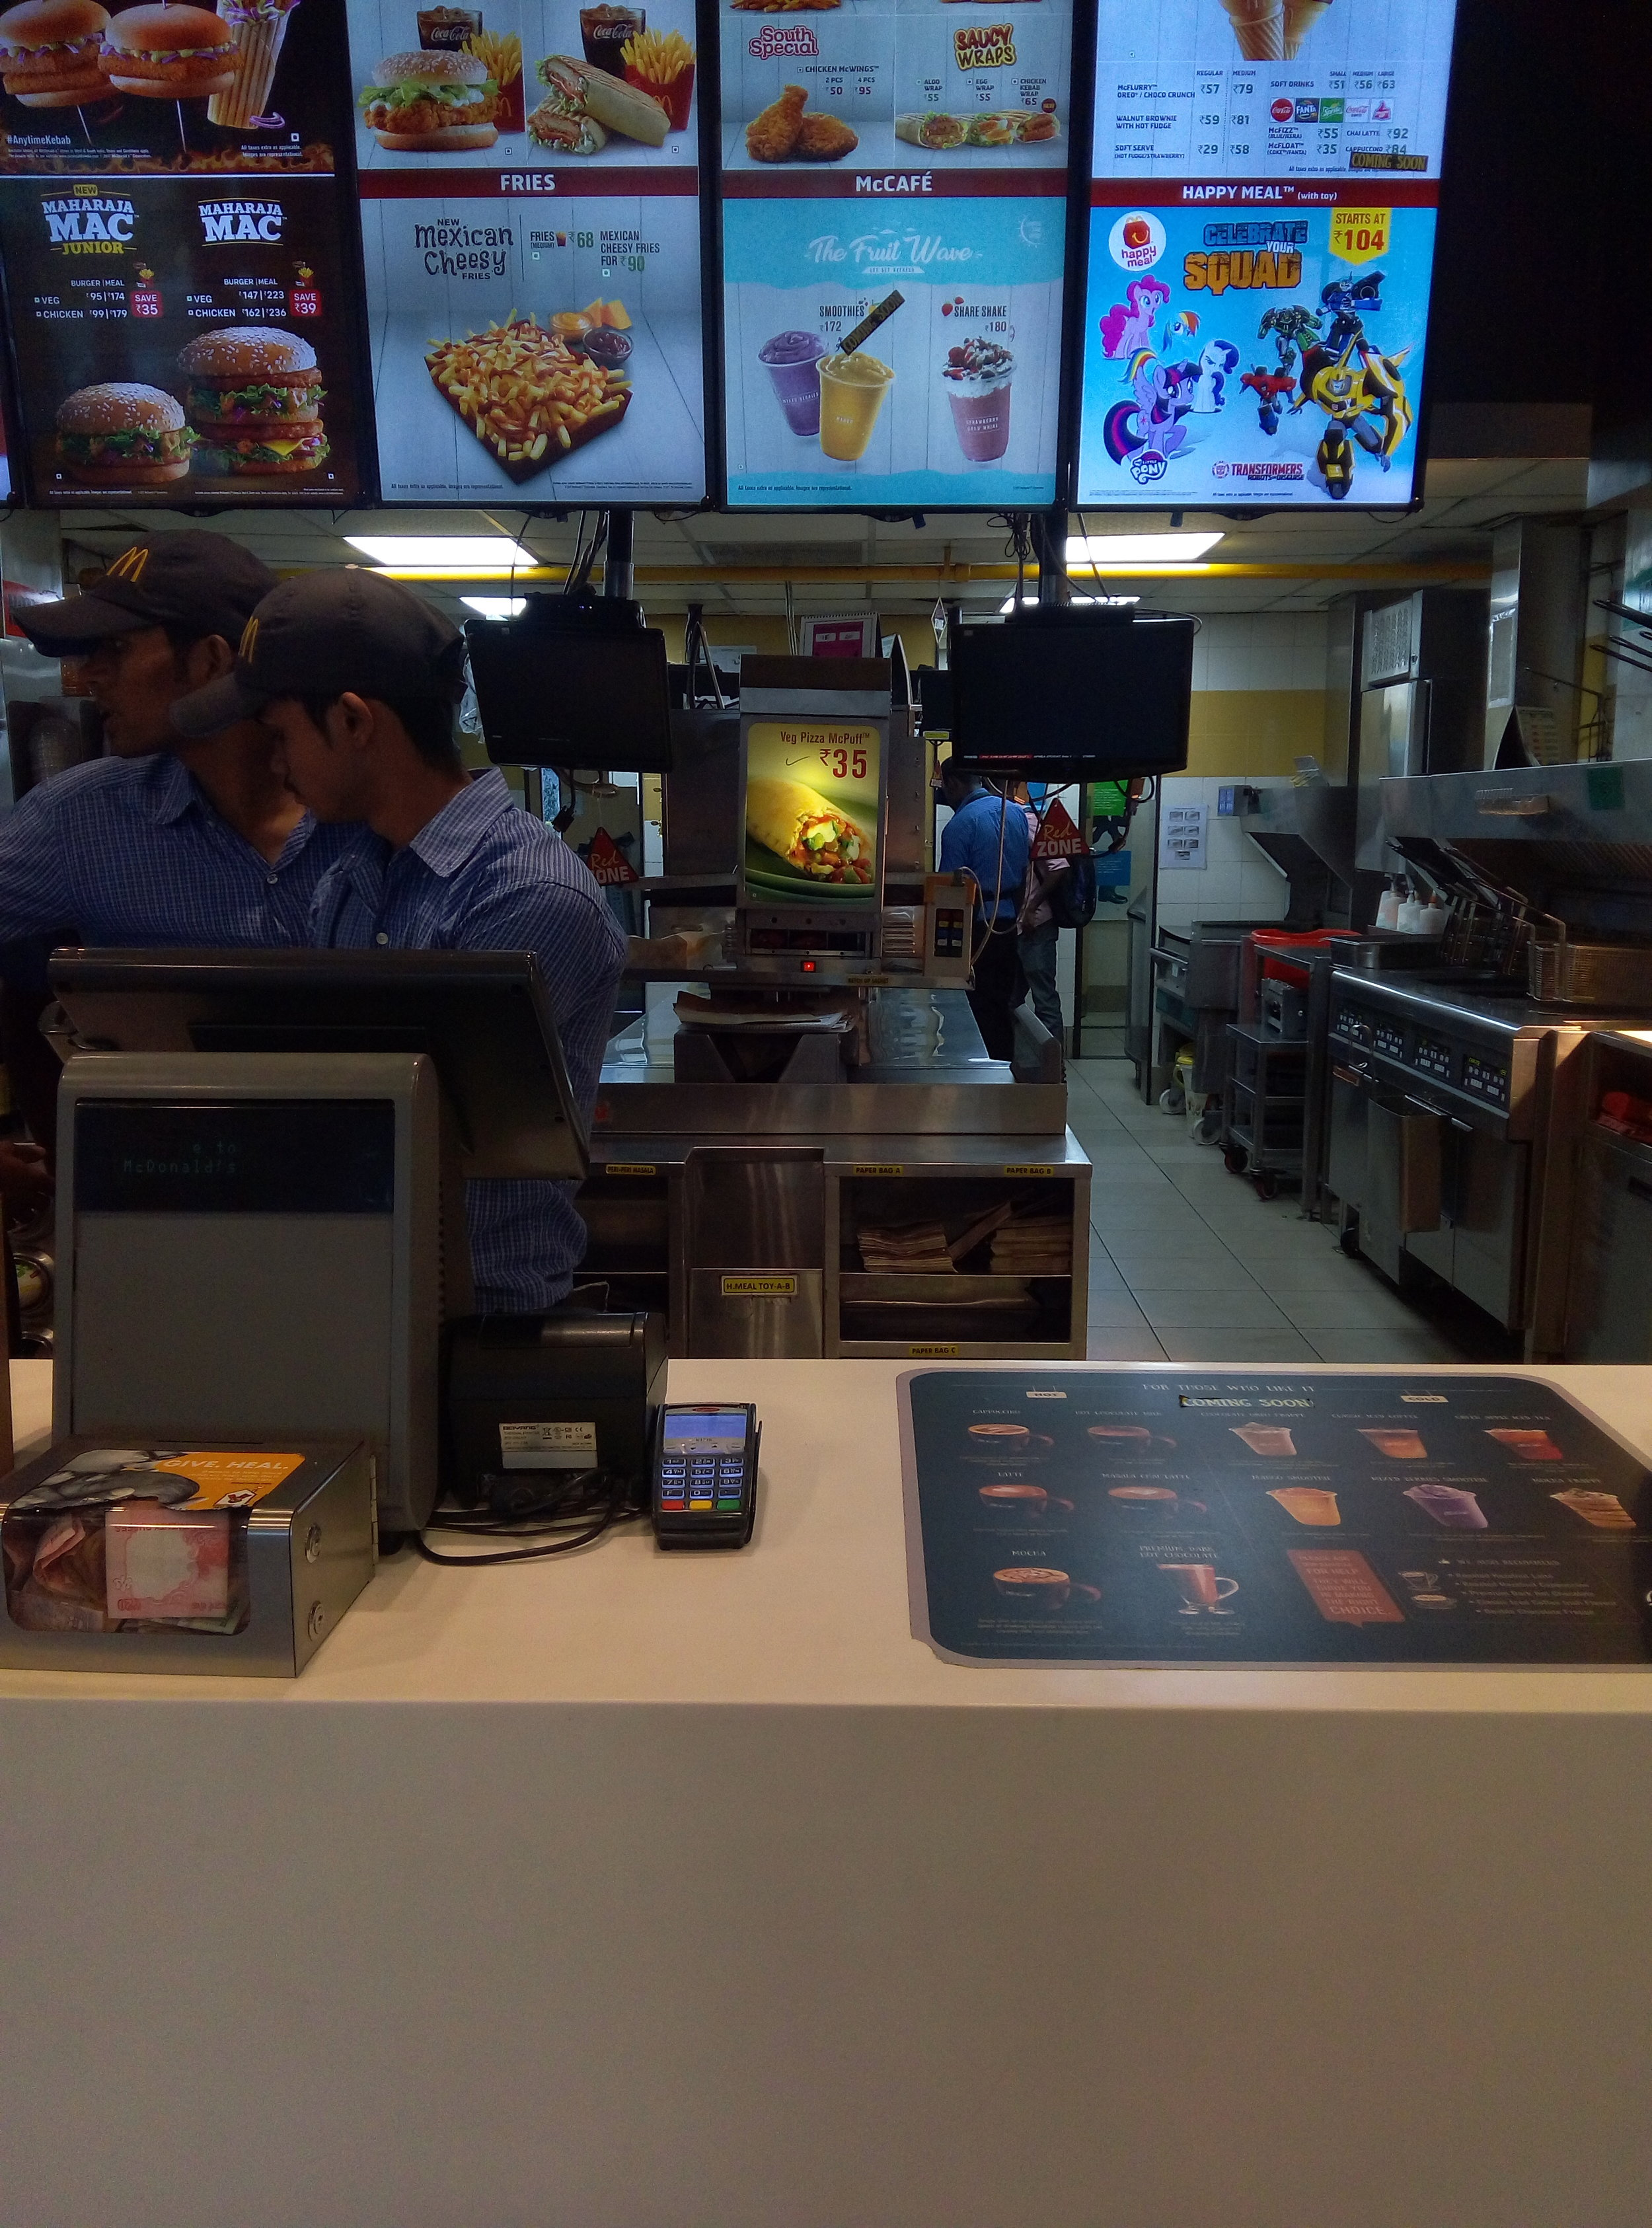 McDonalds Karnataka | Customer Service | Big Data | PritishSocial | Travel and Food